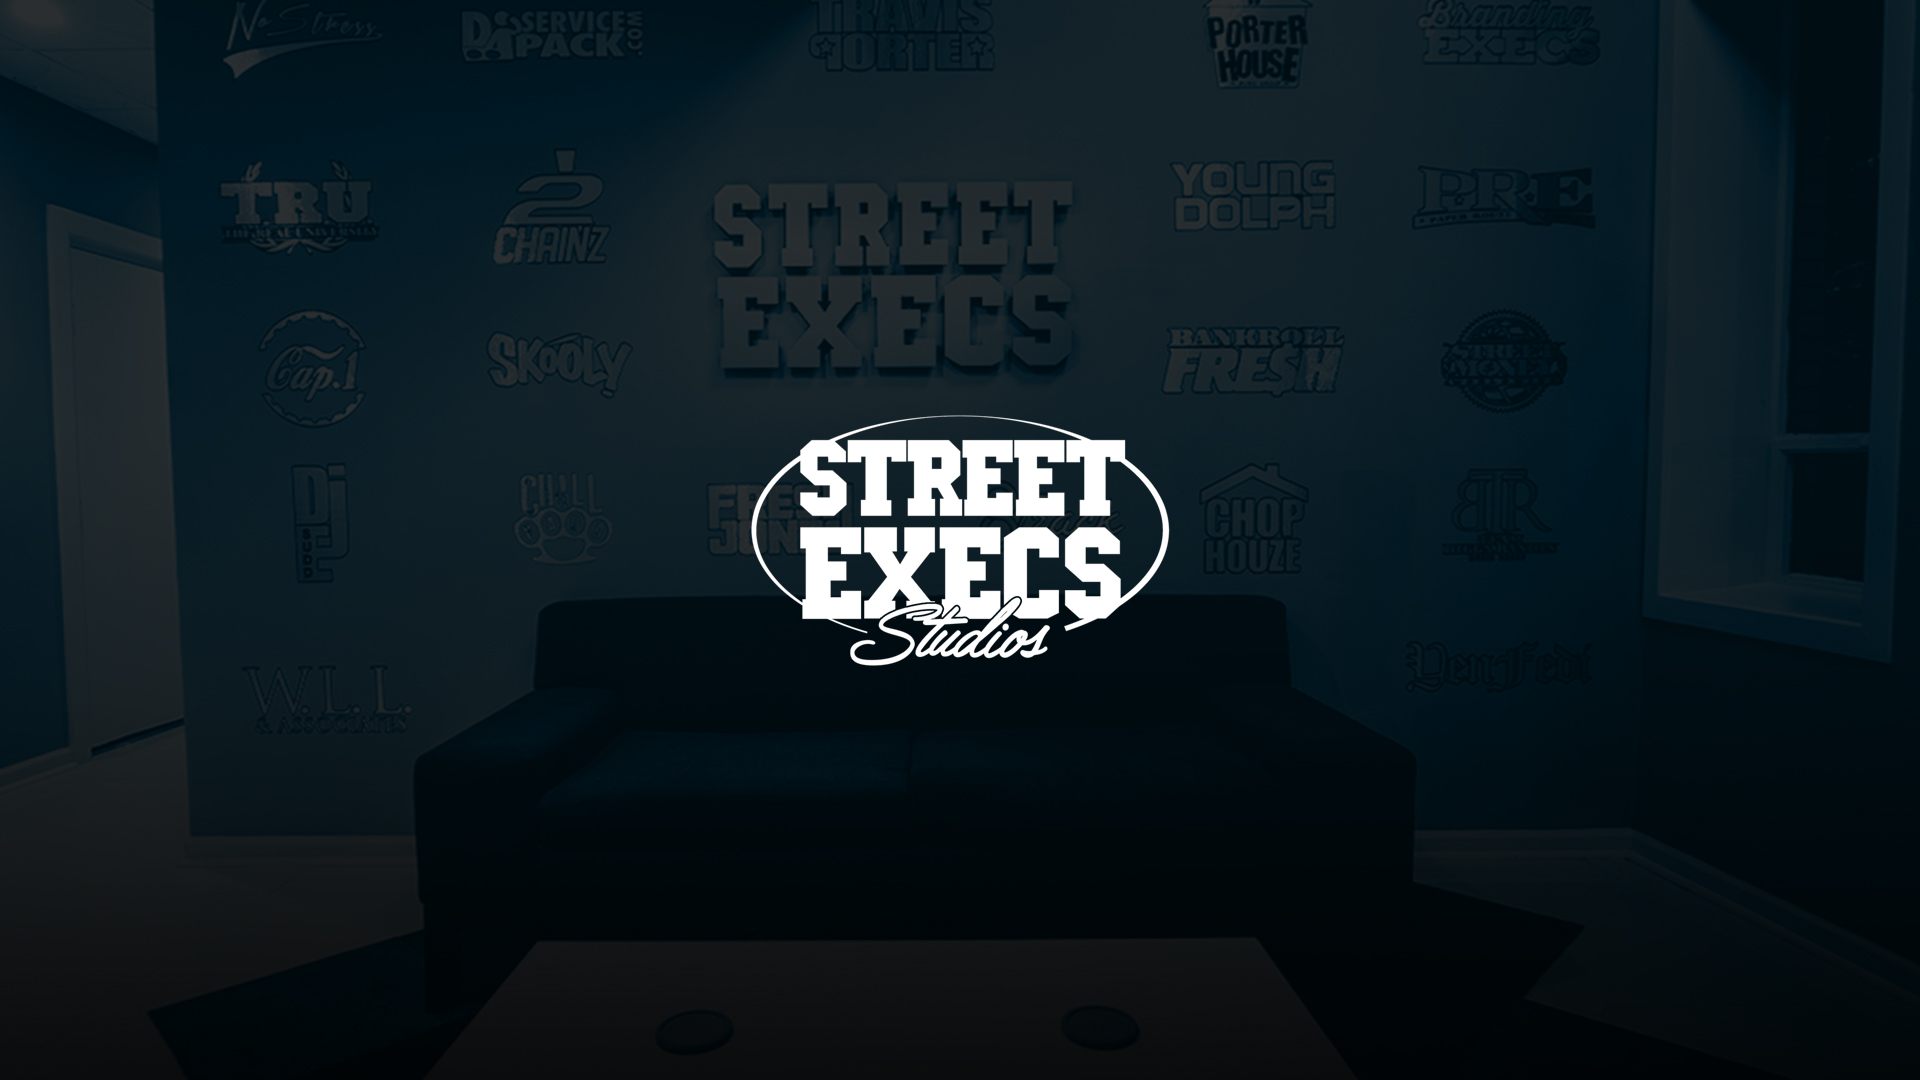 #STREETEXECS-BOOKING-BG.jpg